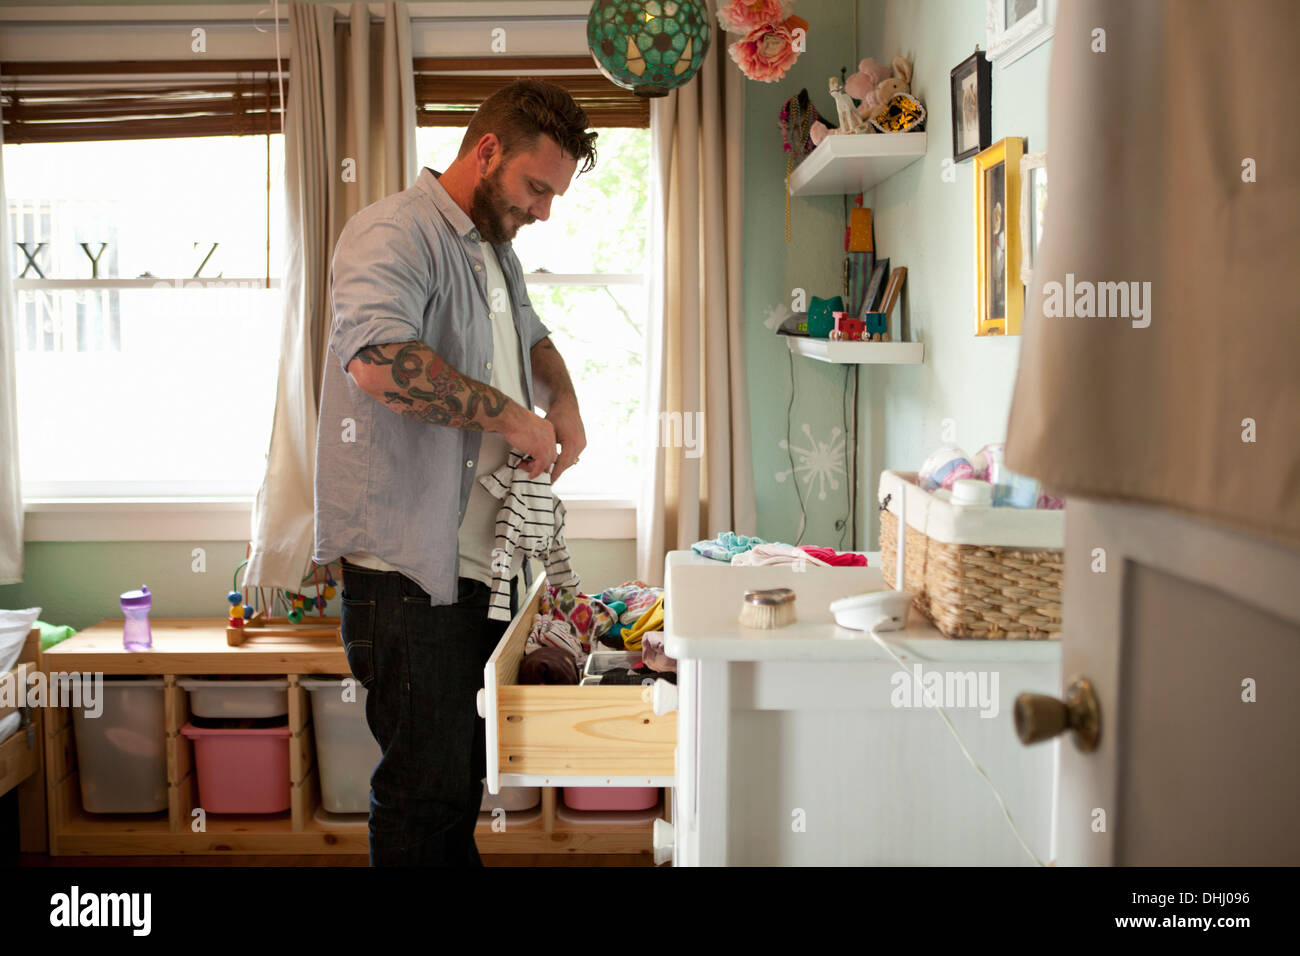 Vater des Kindes Wäsche wegräumen Stockbild